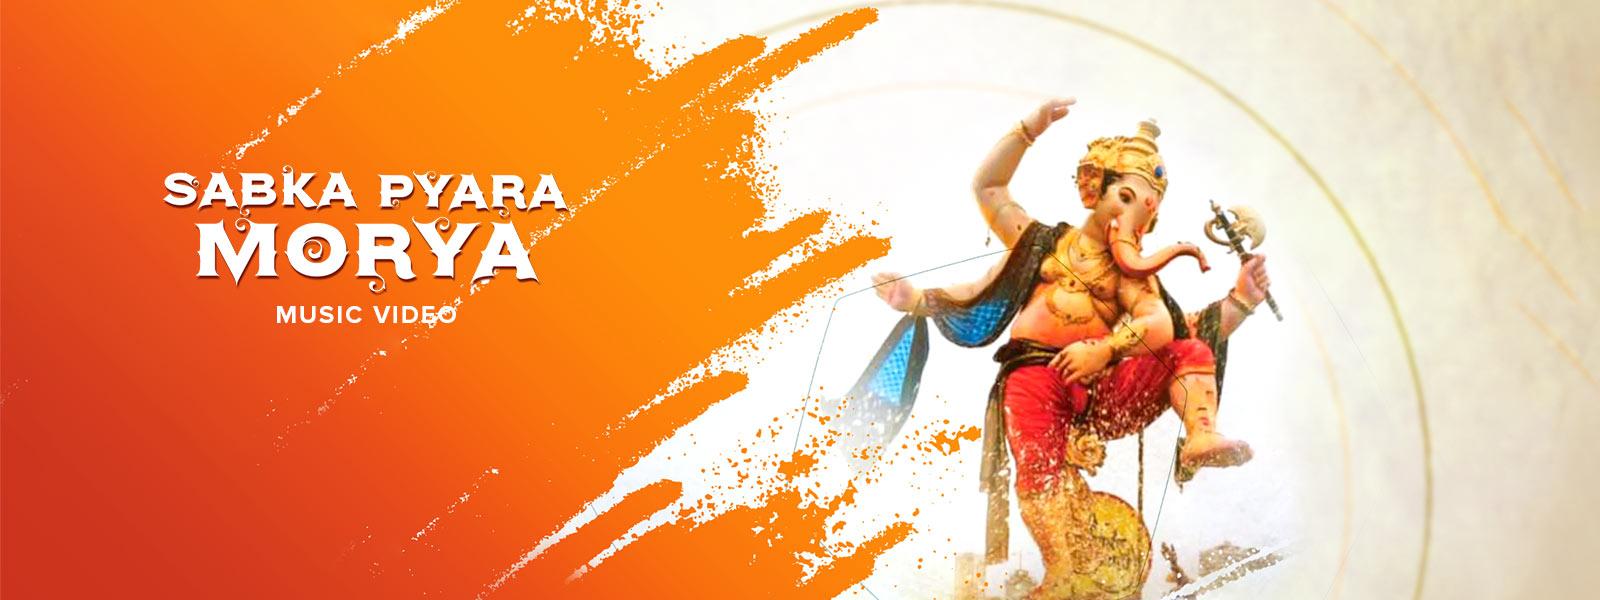 Sabka Pyara Morya - Video Song